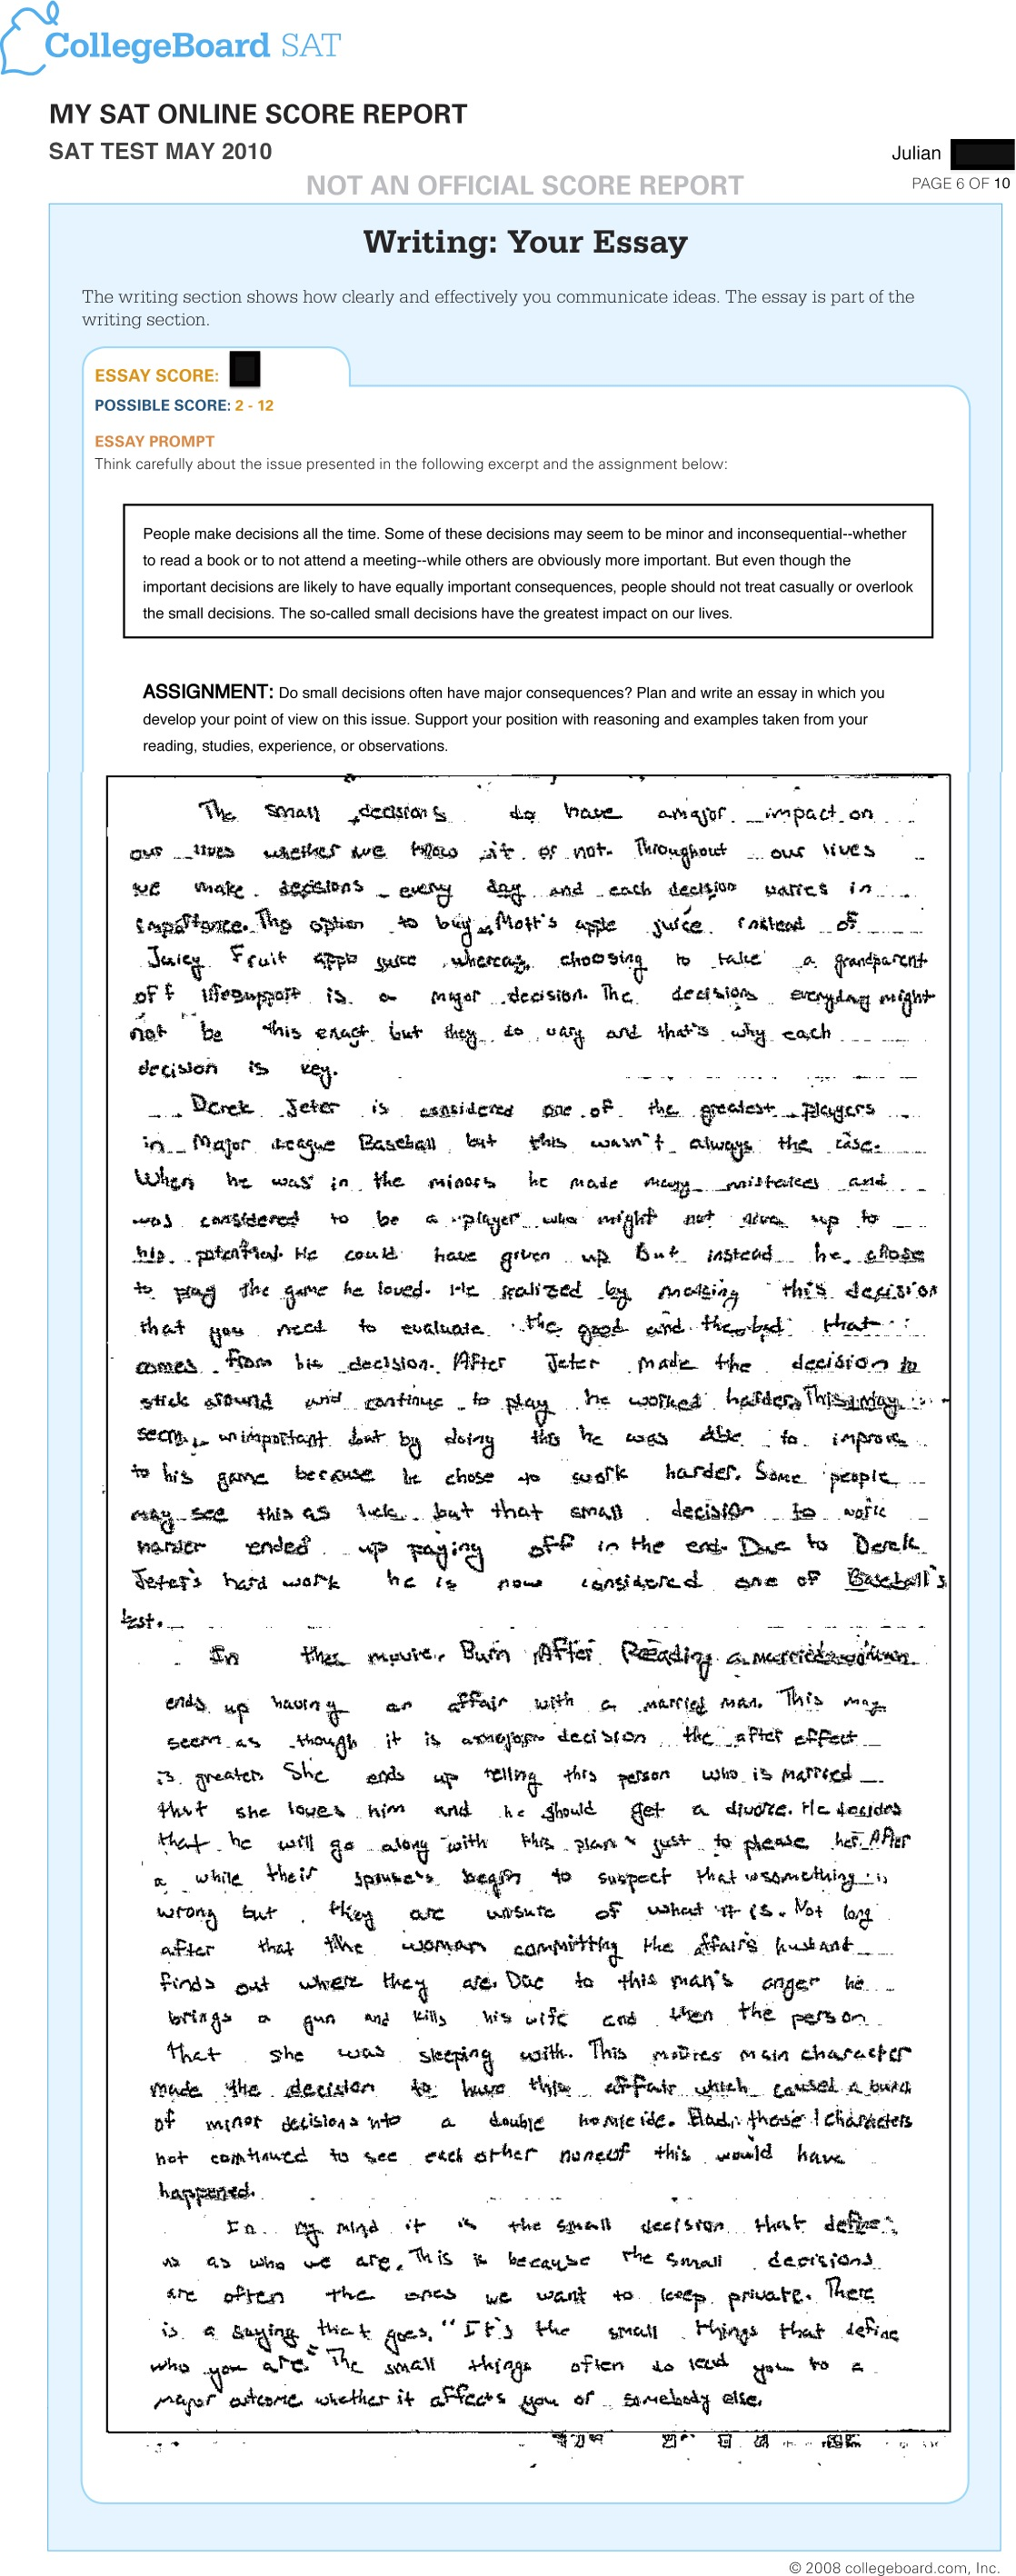 001 Jr May Sat Essay Time Dreaded Limit Breakdown Full